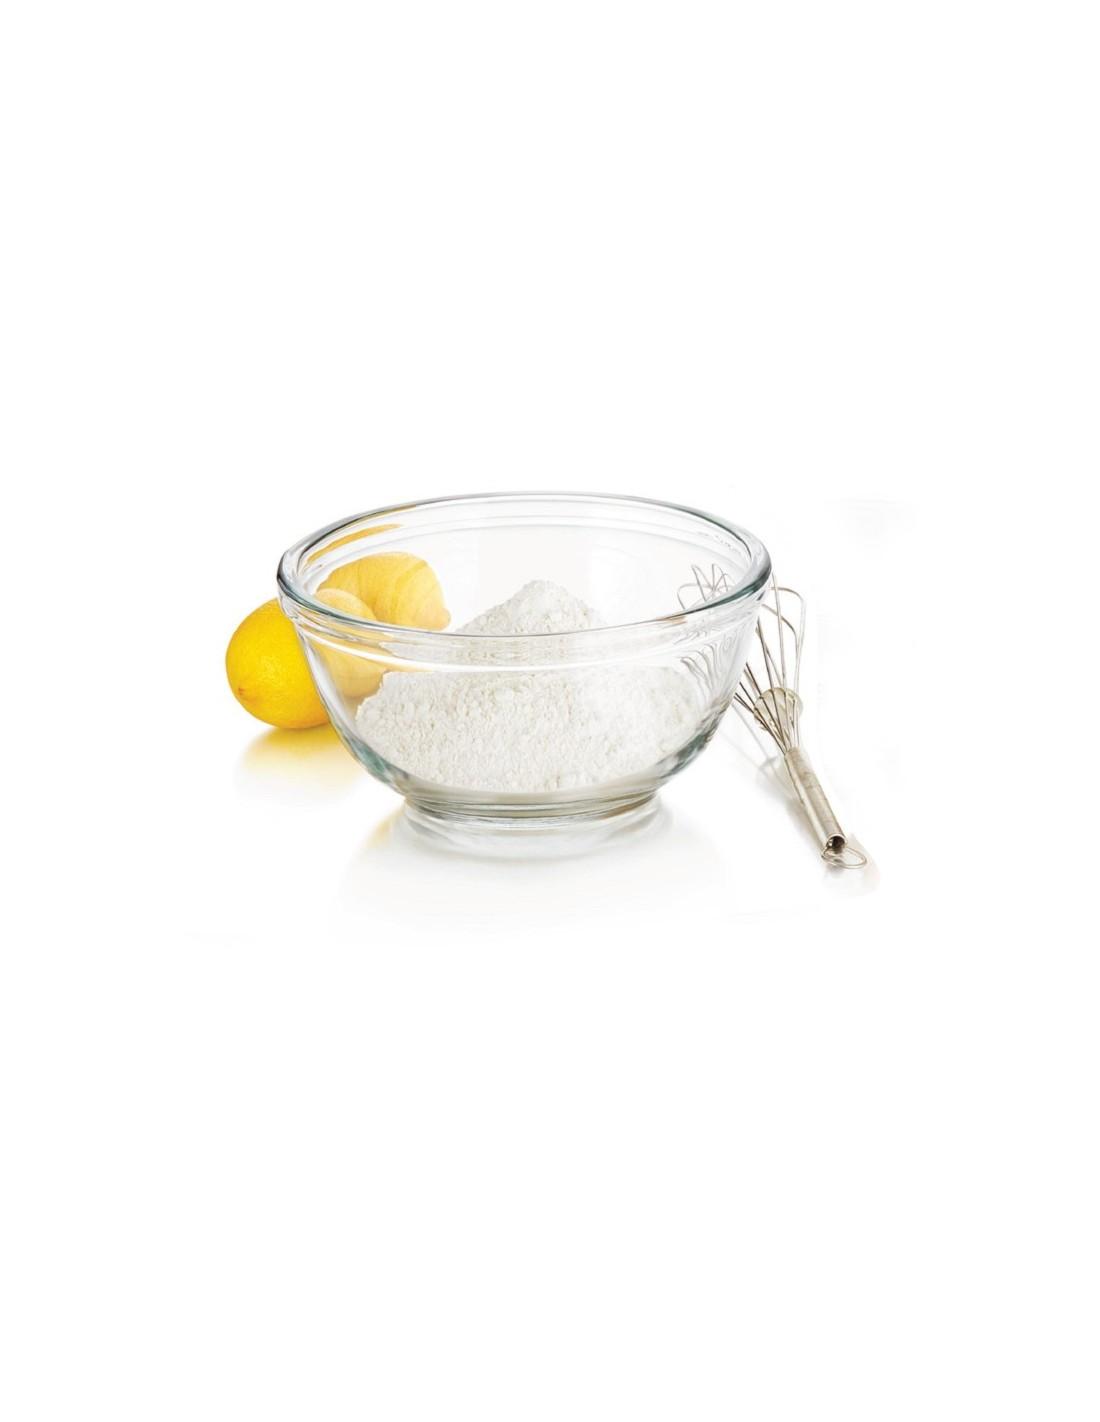 Tazon para batidora mediano 2 litros pyrorey for Utensilios de cocina batidora